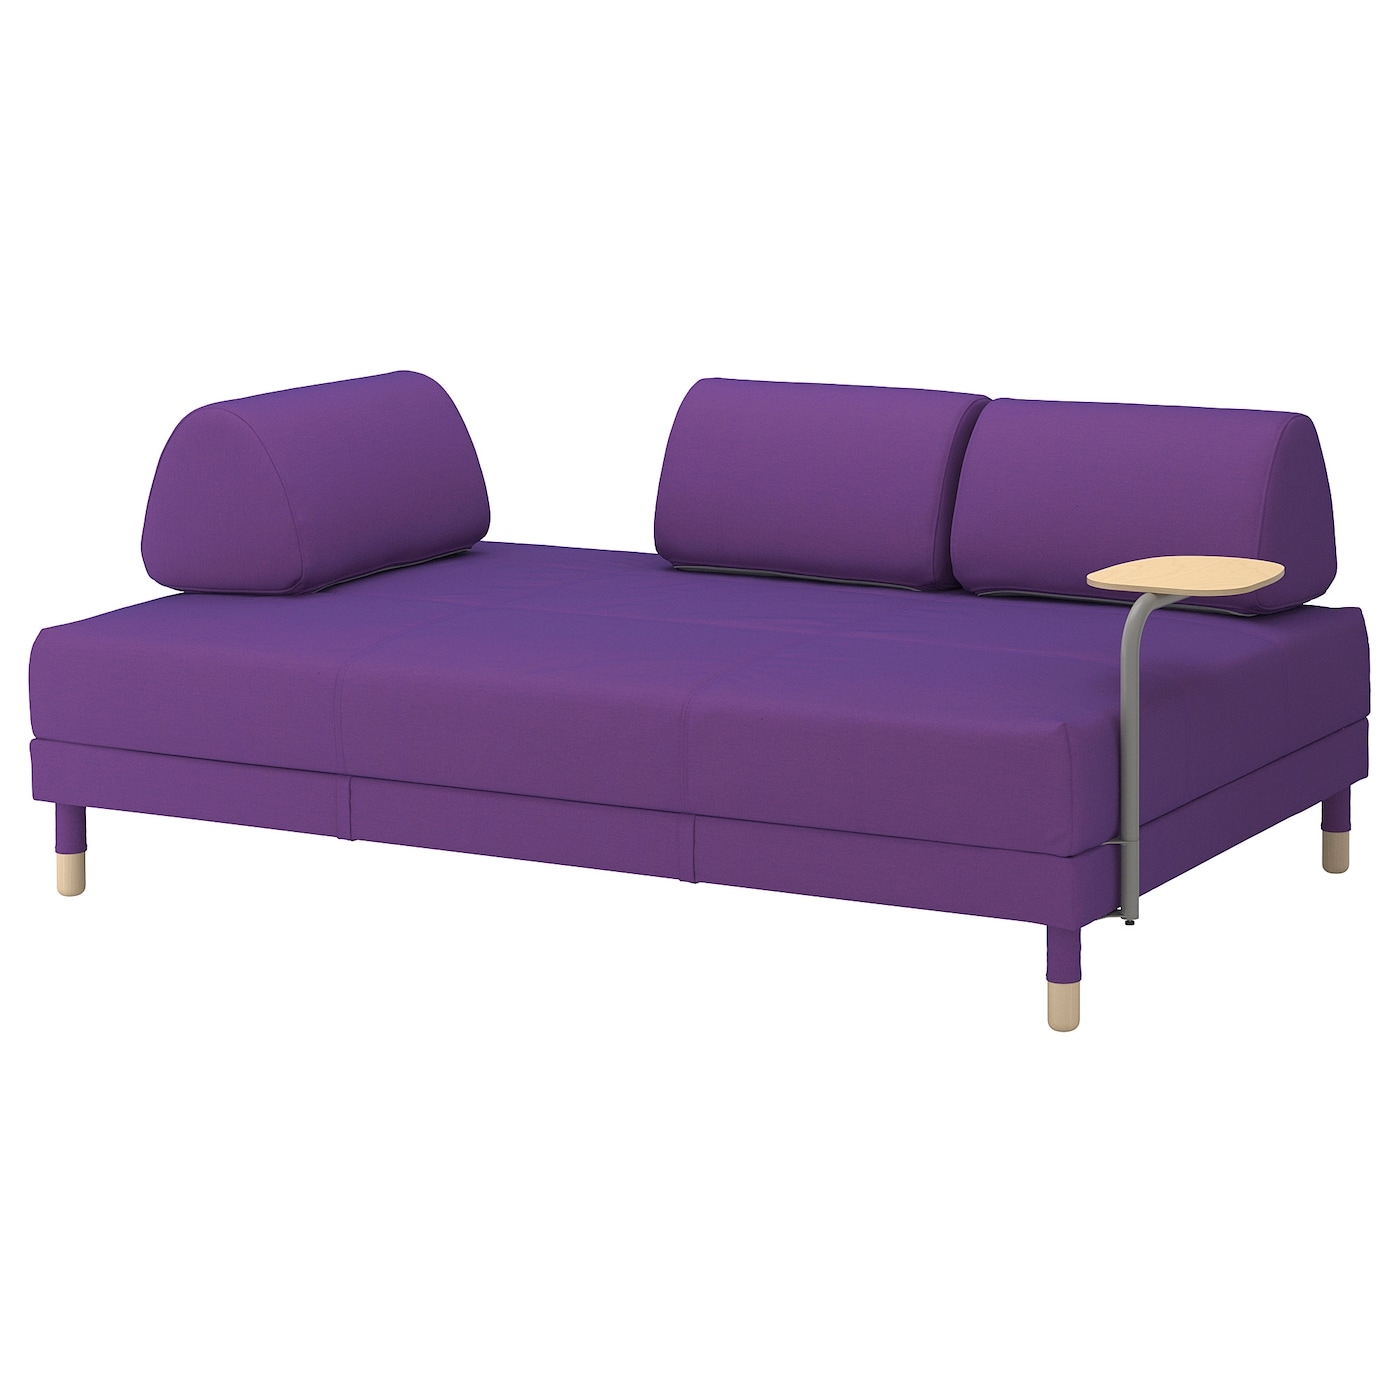 IKEA FLOTTEBO Sofa rozkładana ze stolikiem, Vissle fiolet, 120 cm